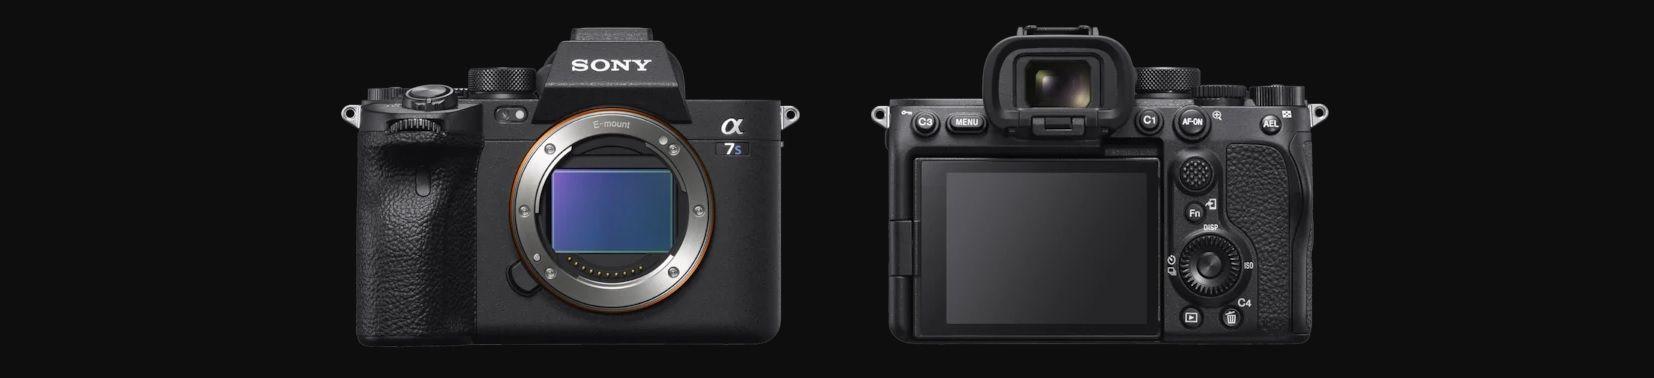 Sony Alpha 7S III - boîtier nu image 10 | Rakuten